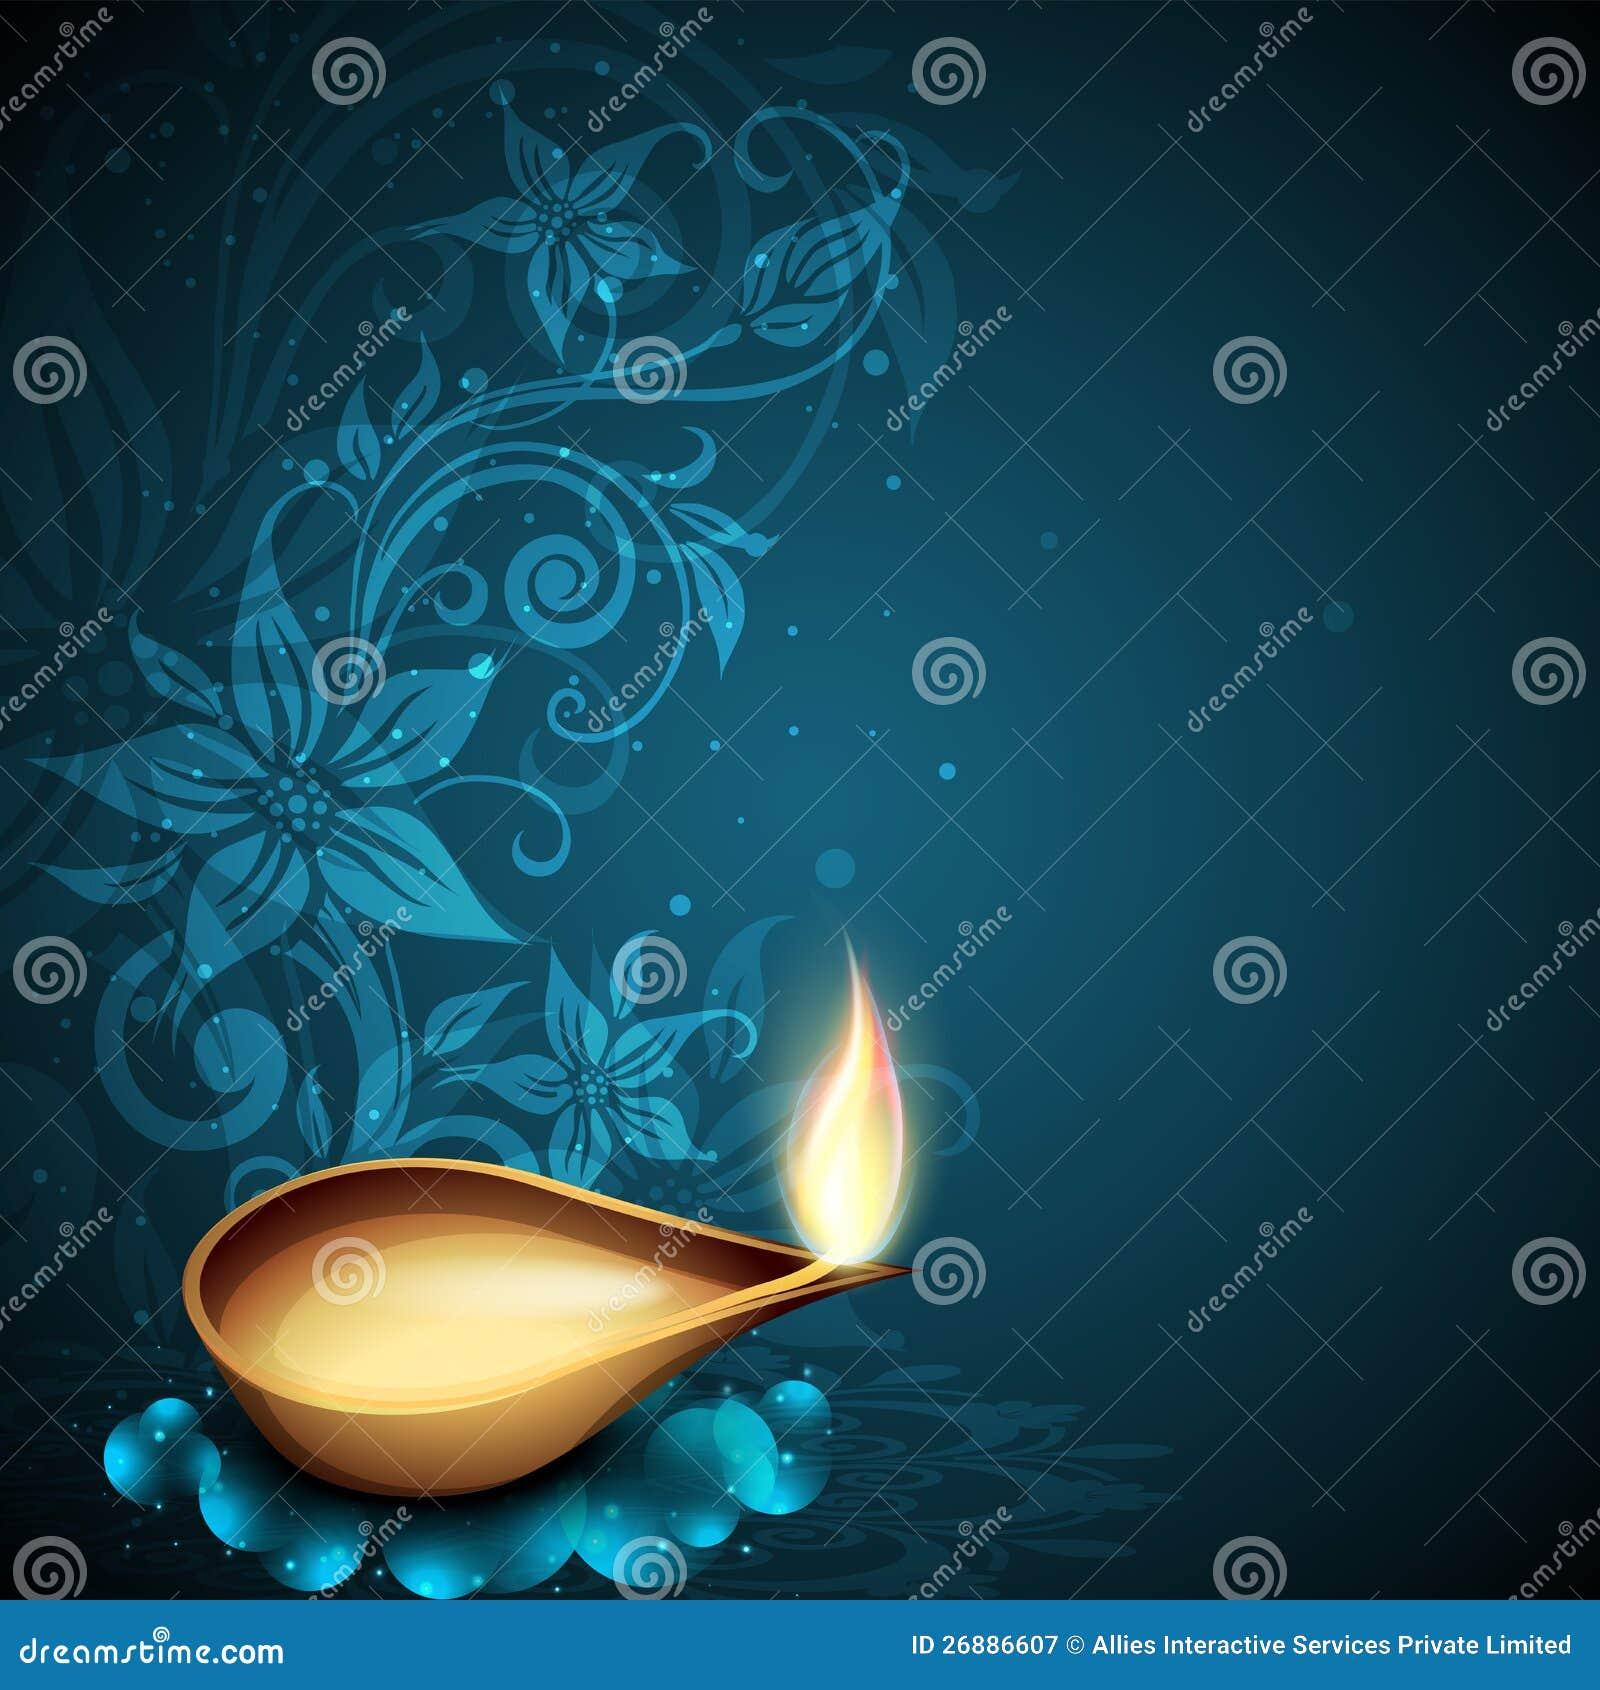 Greeting card for diwali celebration stock vector illustration of greeting card for diwali celebration india illuminate m4hsunfo Gallery